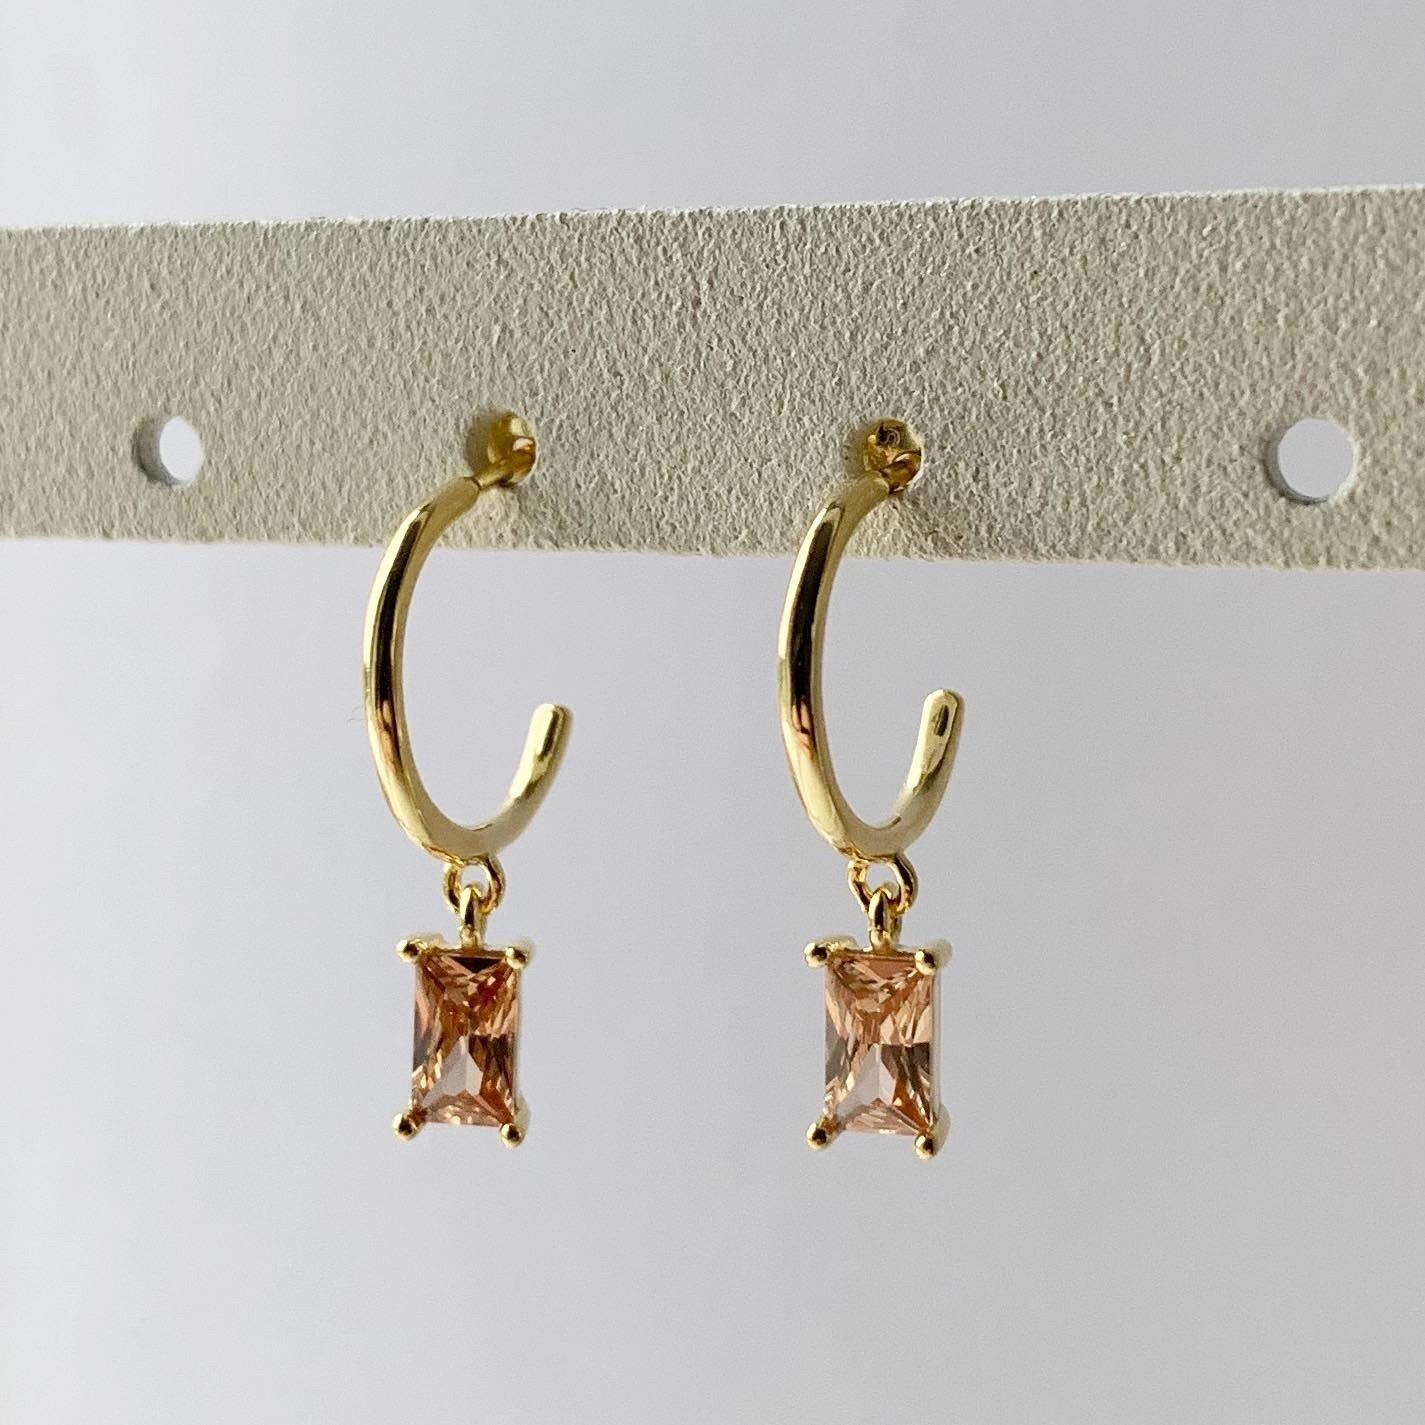 Oranje rechthoekige oorringetjes goud/925 sterling zilver